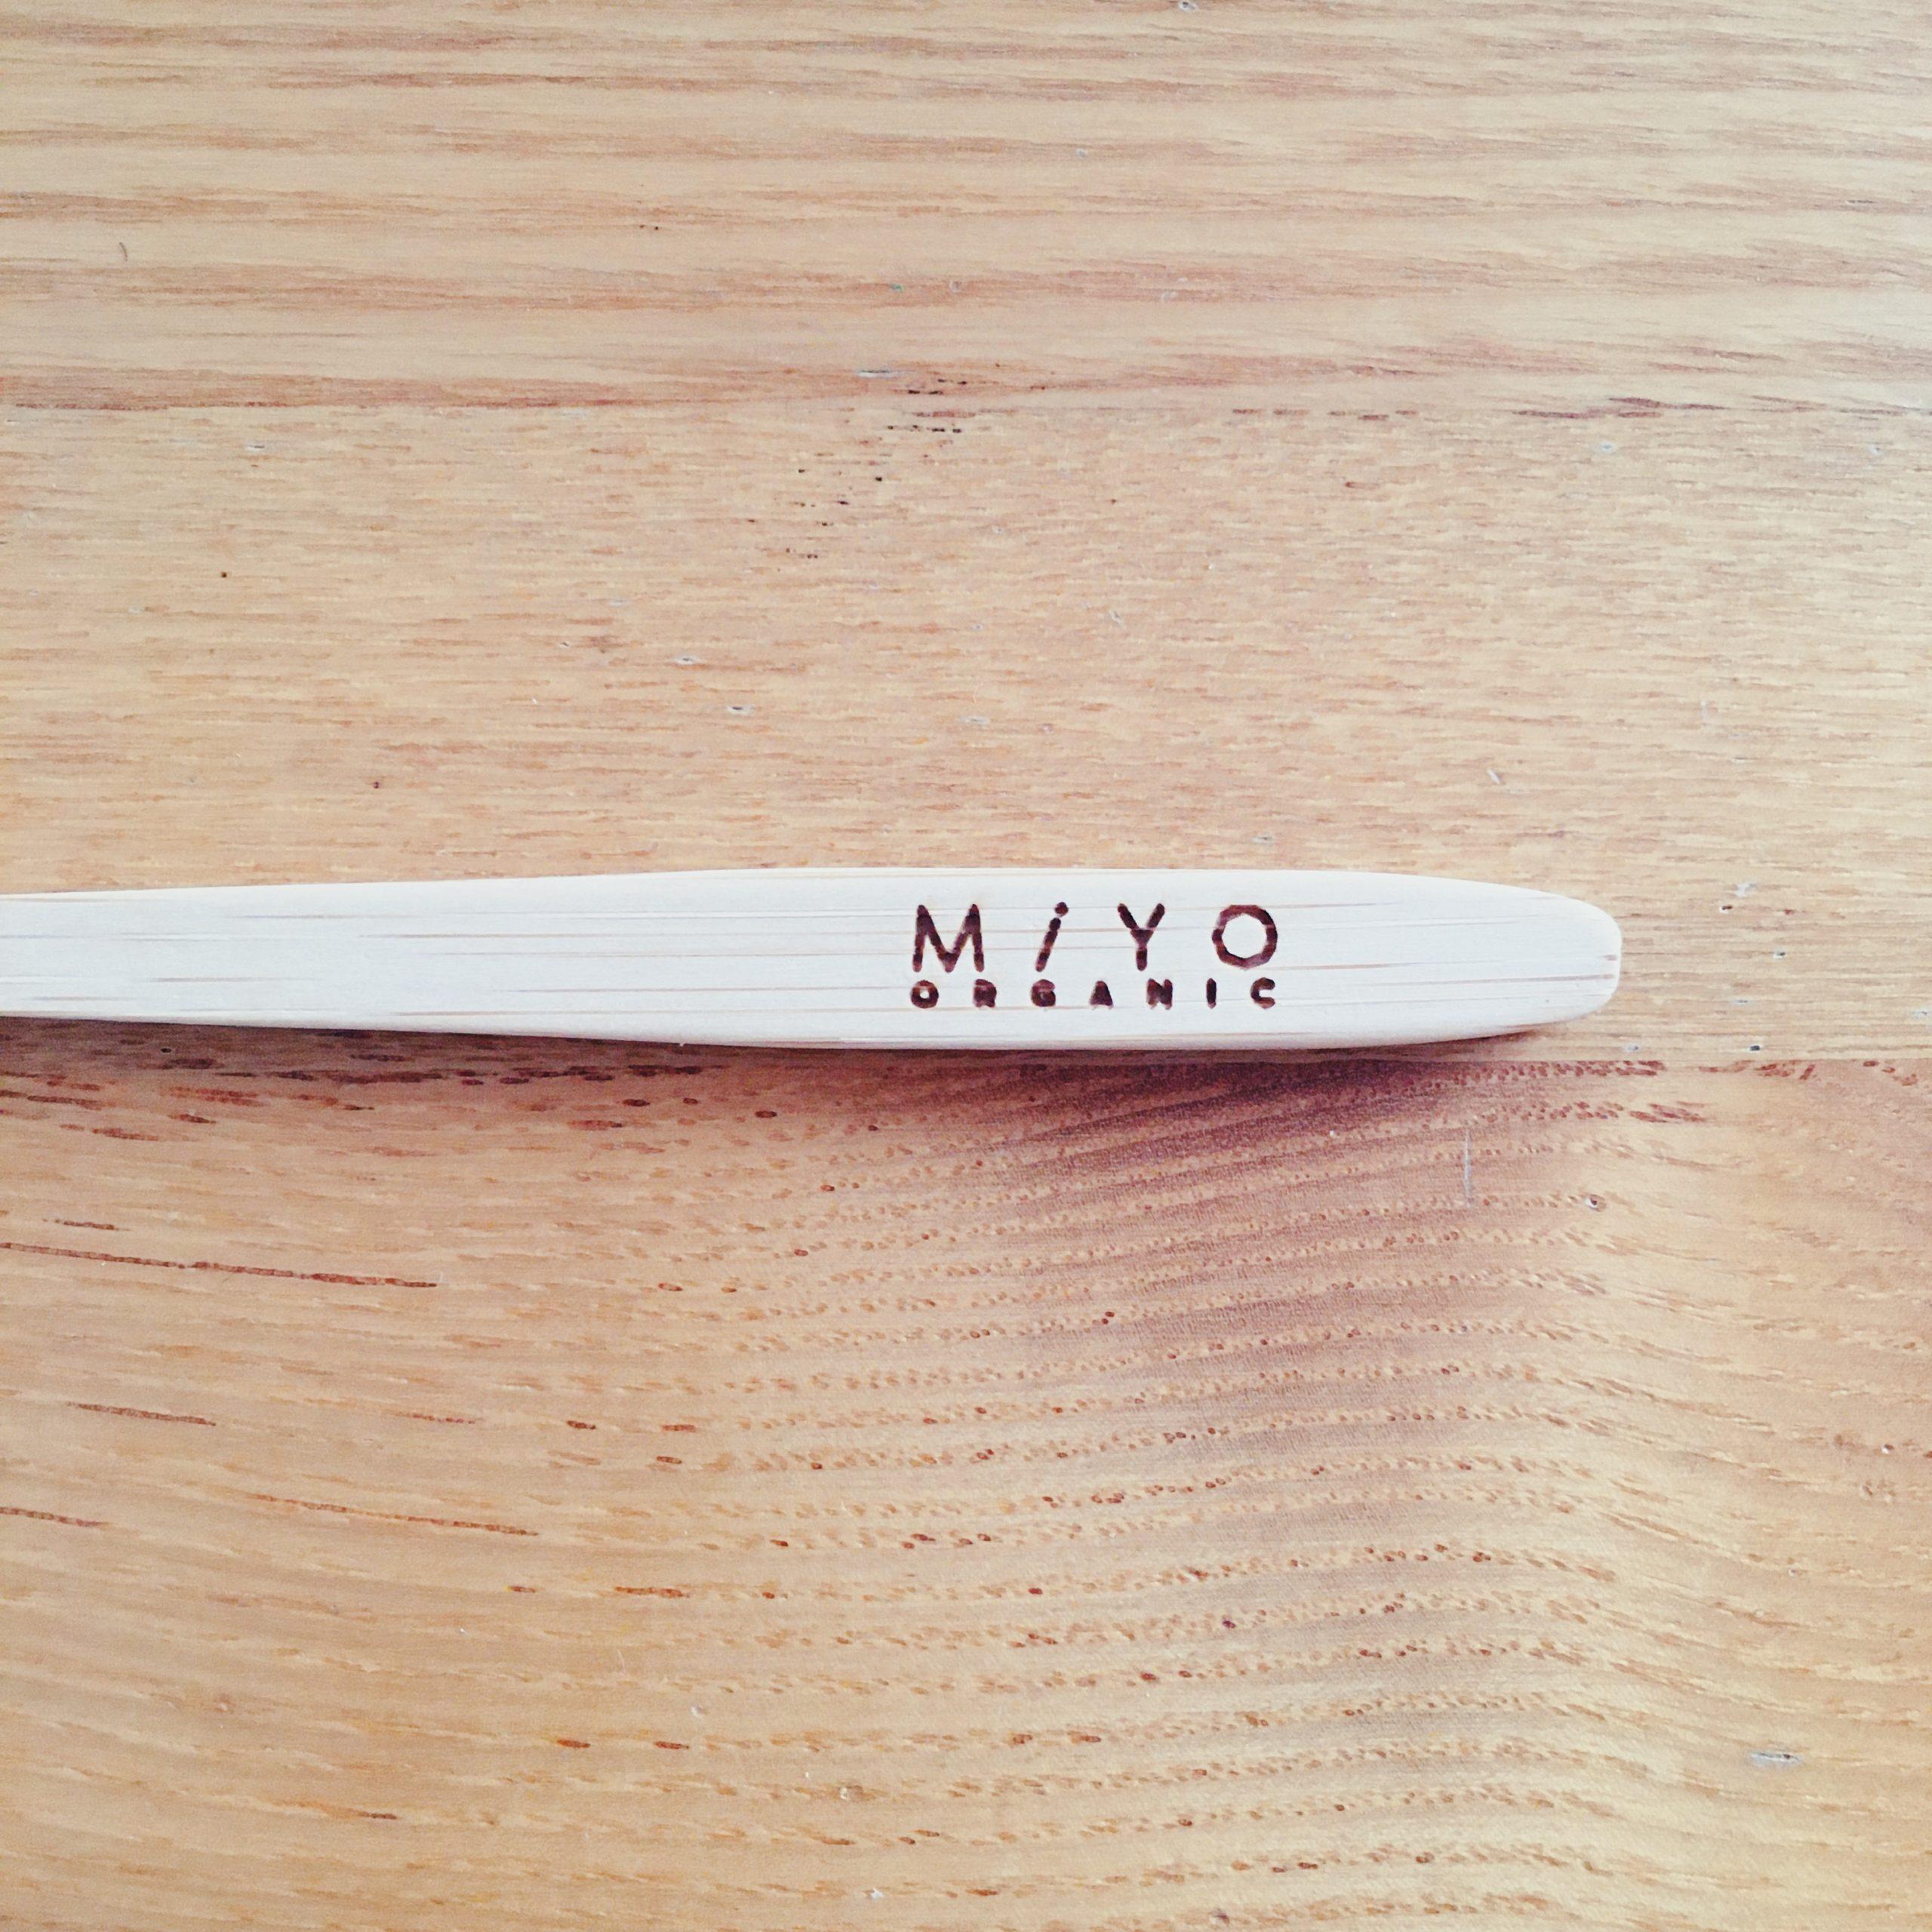 MiYo ORGANIC JAPAN Japanese ethical bland bamboo teethbrush 歯磨き 歯ブラシ 竹